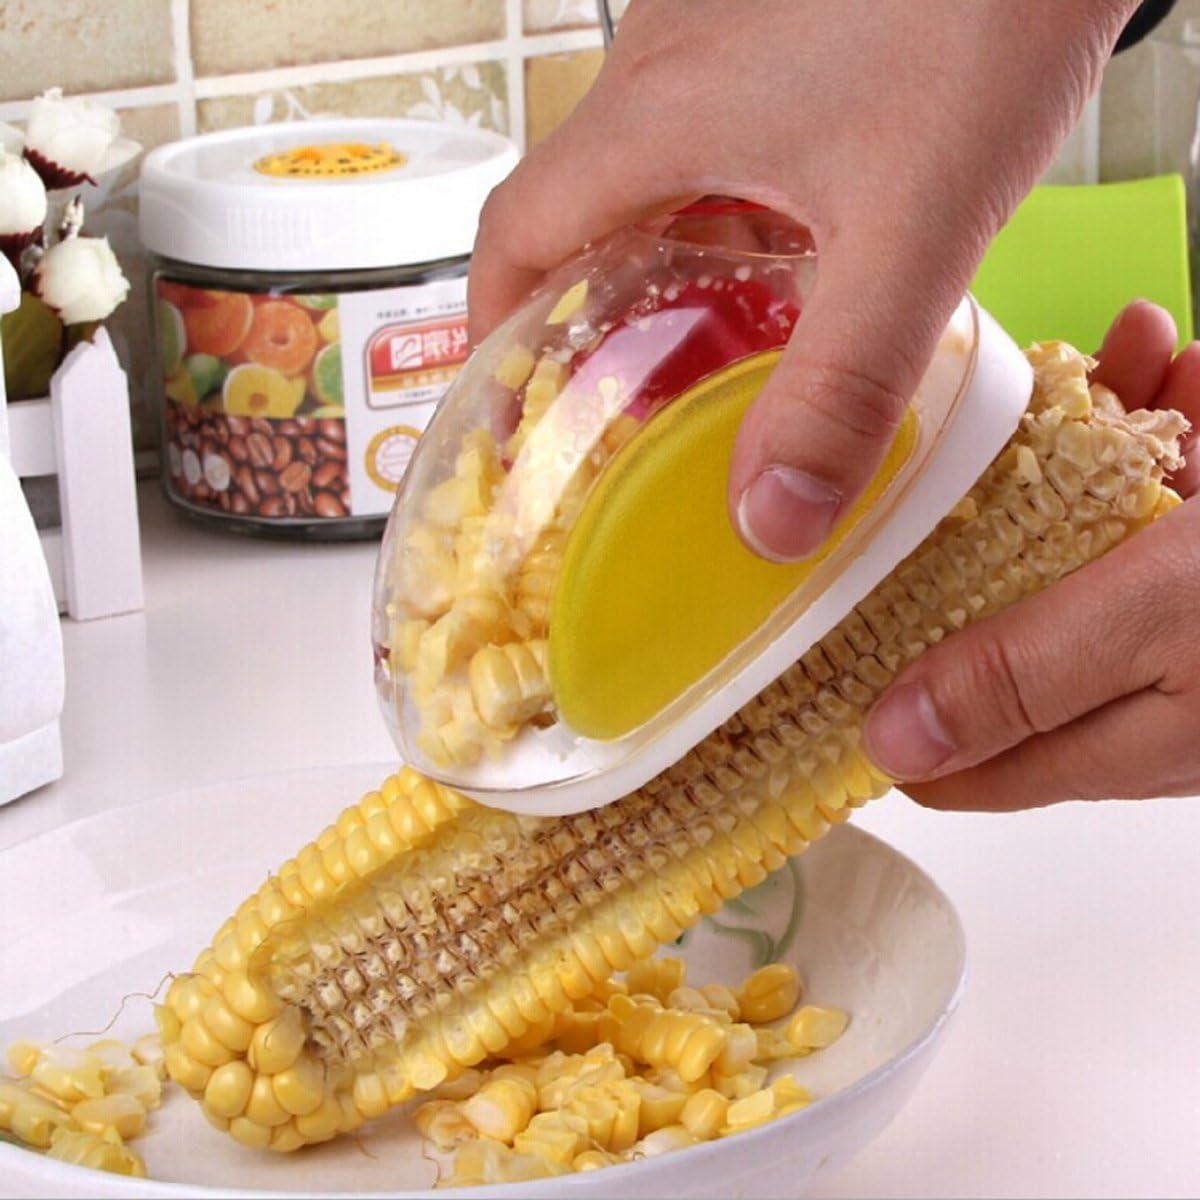 OUNONA Pelador de ma/íz Cocina Herramientas Remover con protector de mano